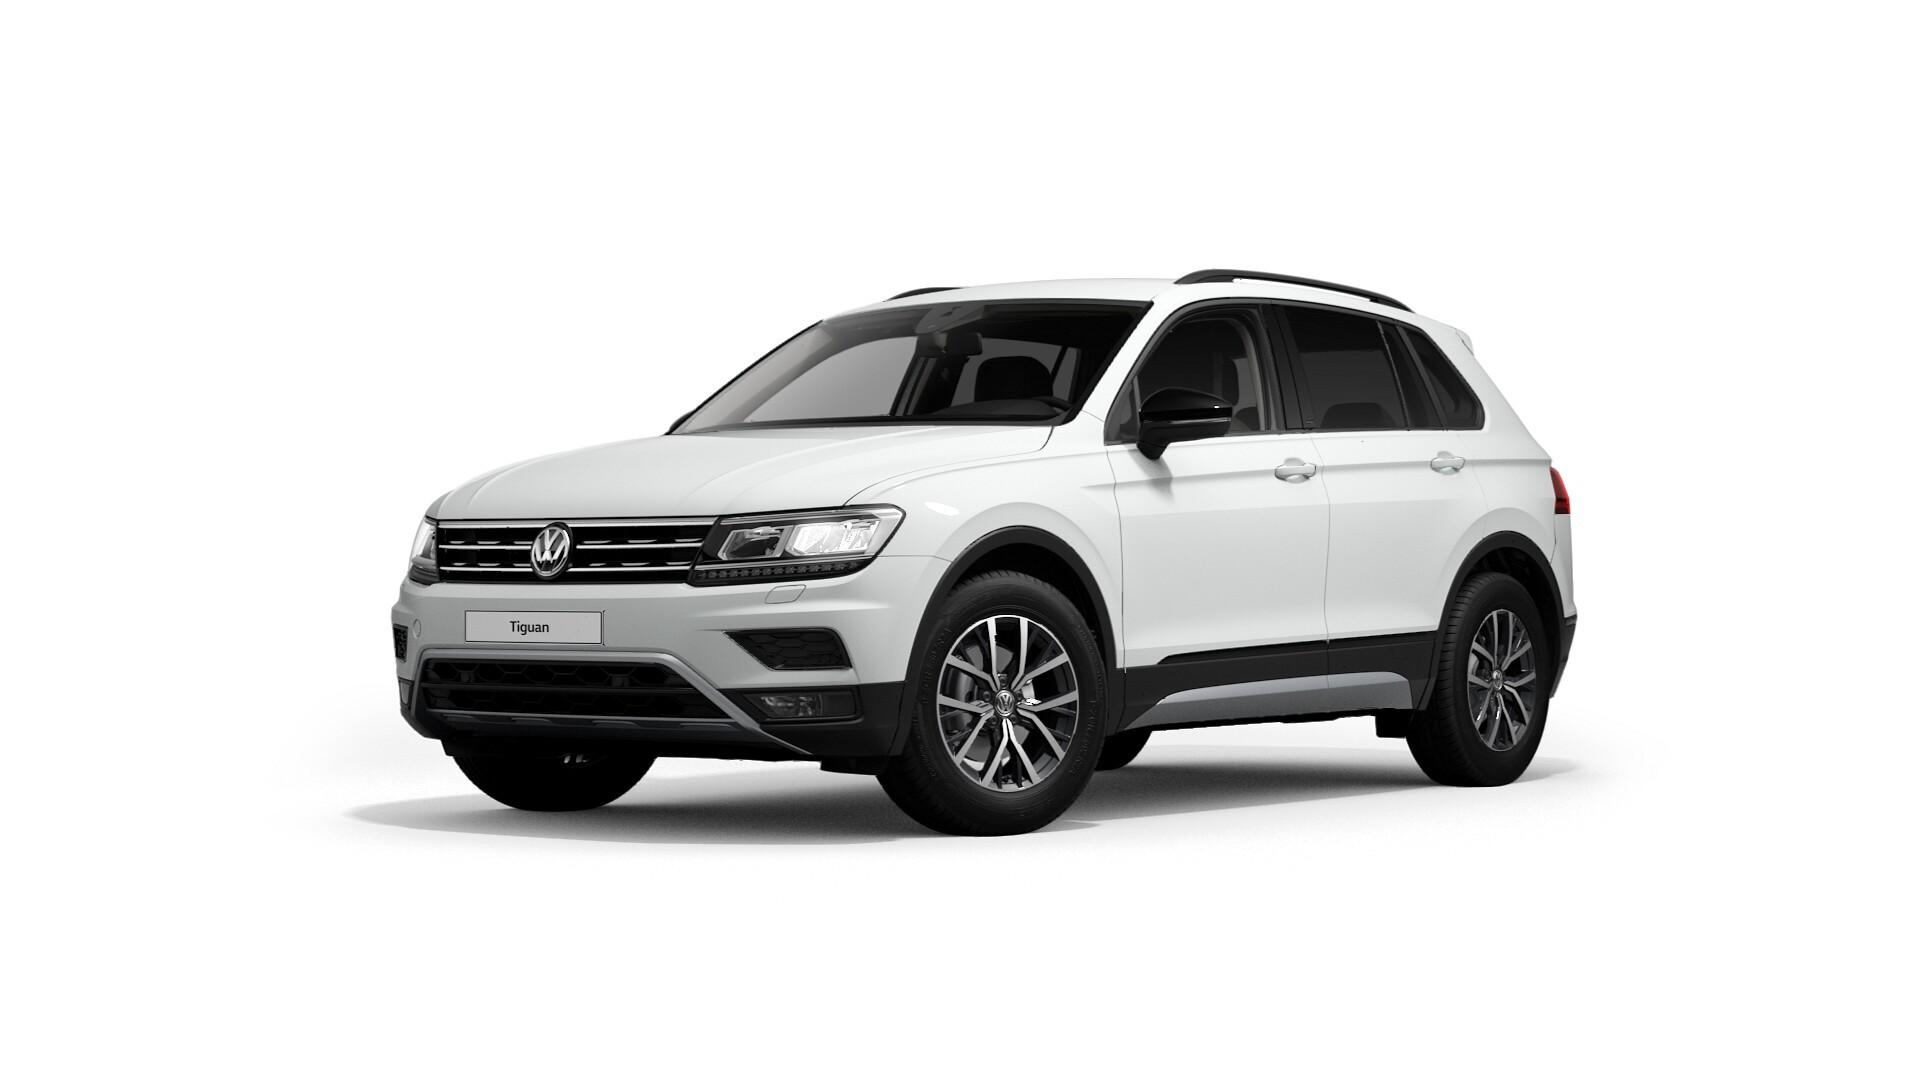 Volkswagen Tiguan Внедорожник (Offroad)